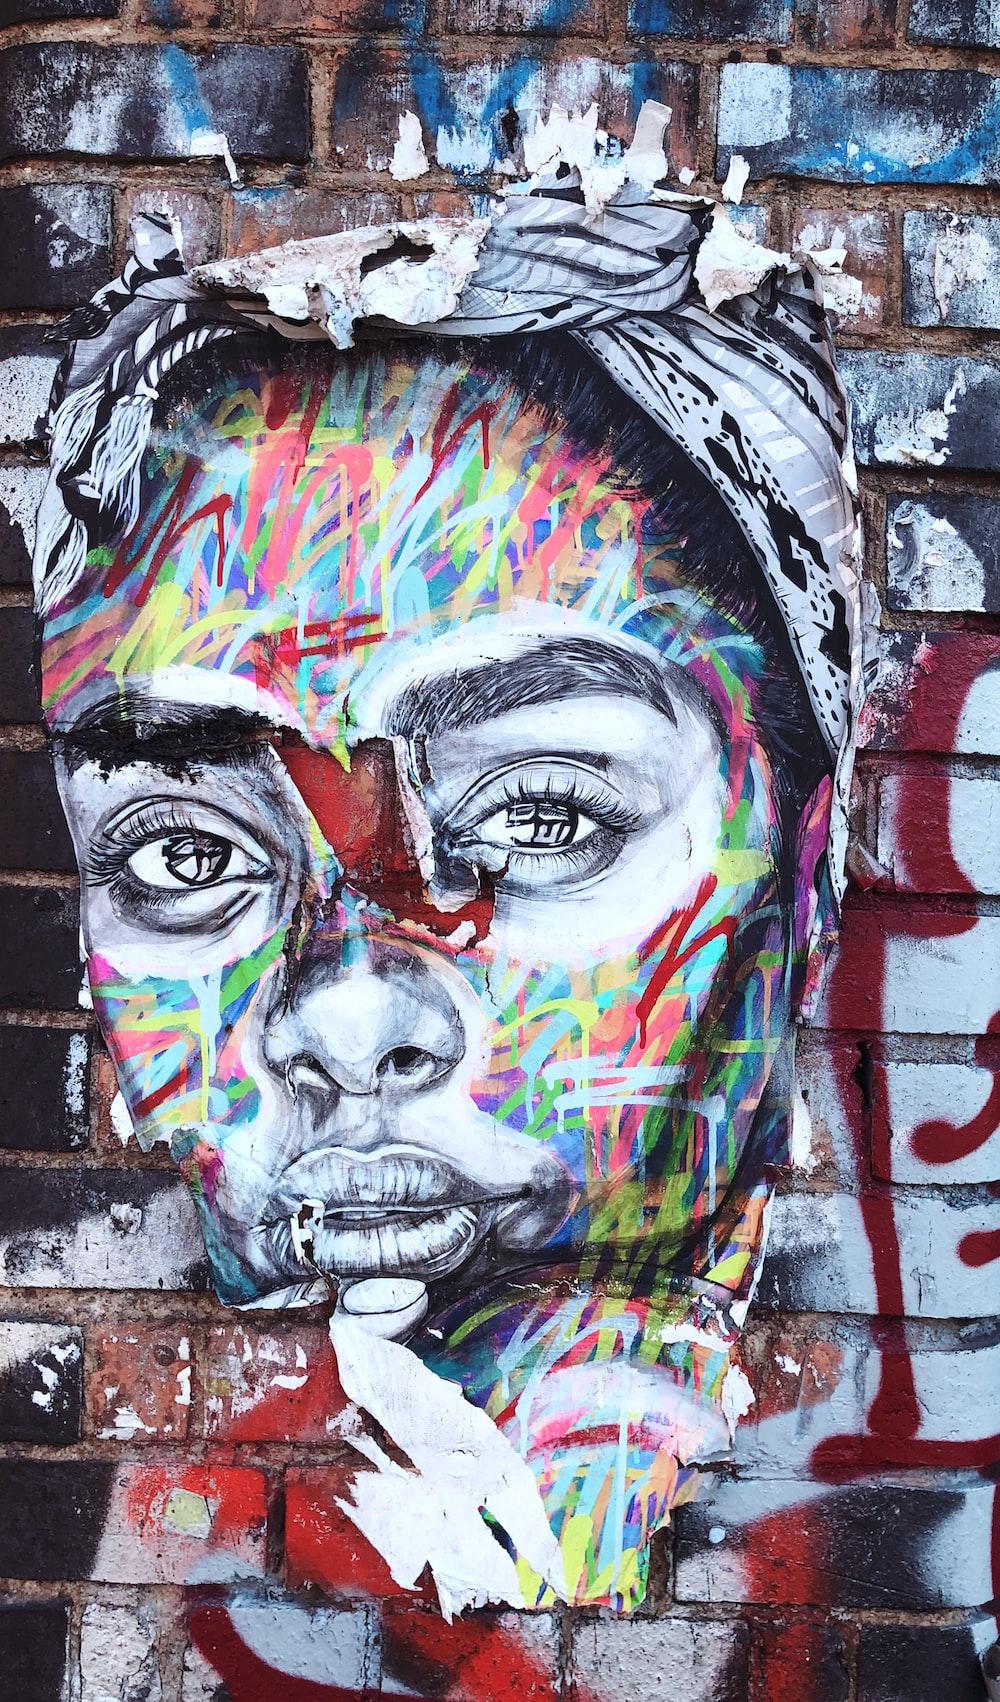 graffiti of woman's face on wall